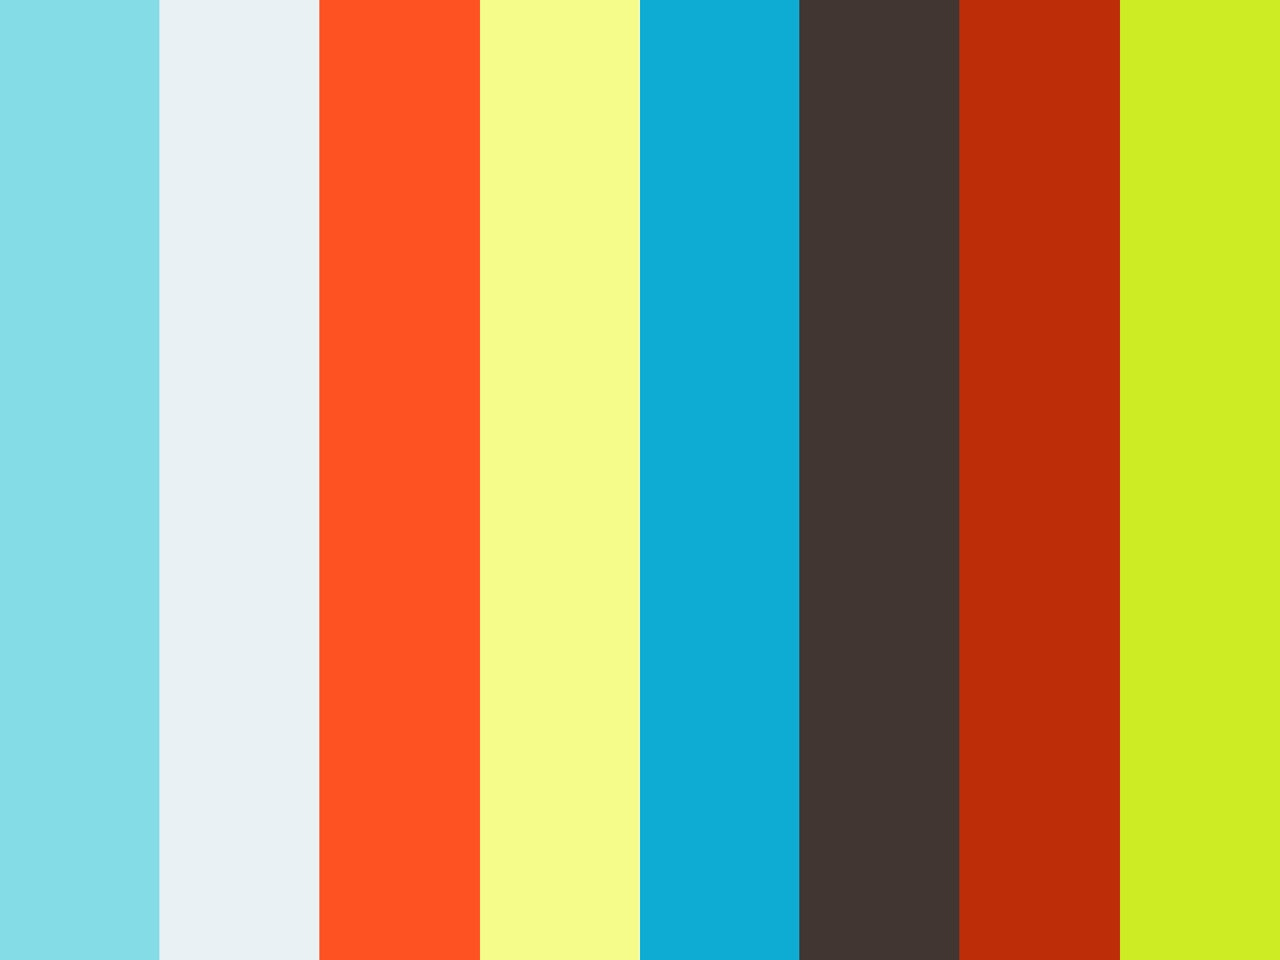 The Pimpin Show w/ DJ E1 & Leletunez - Episode #53 - 5.17.13